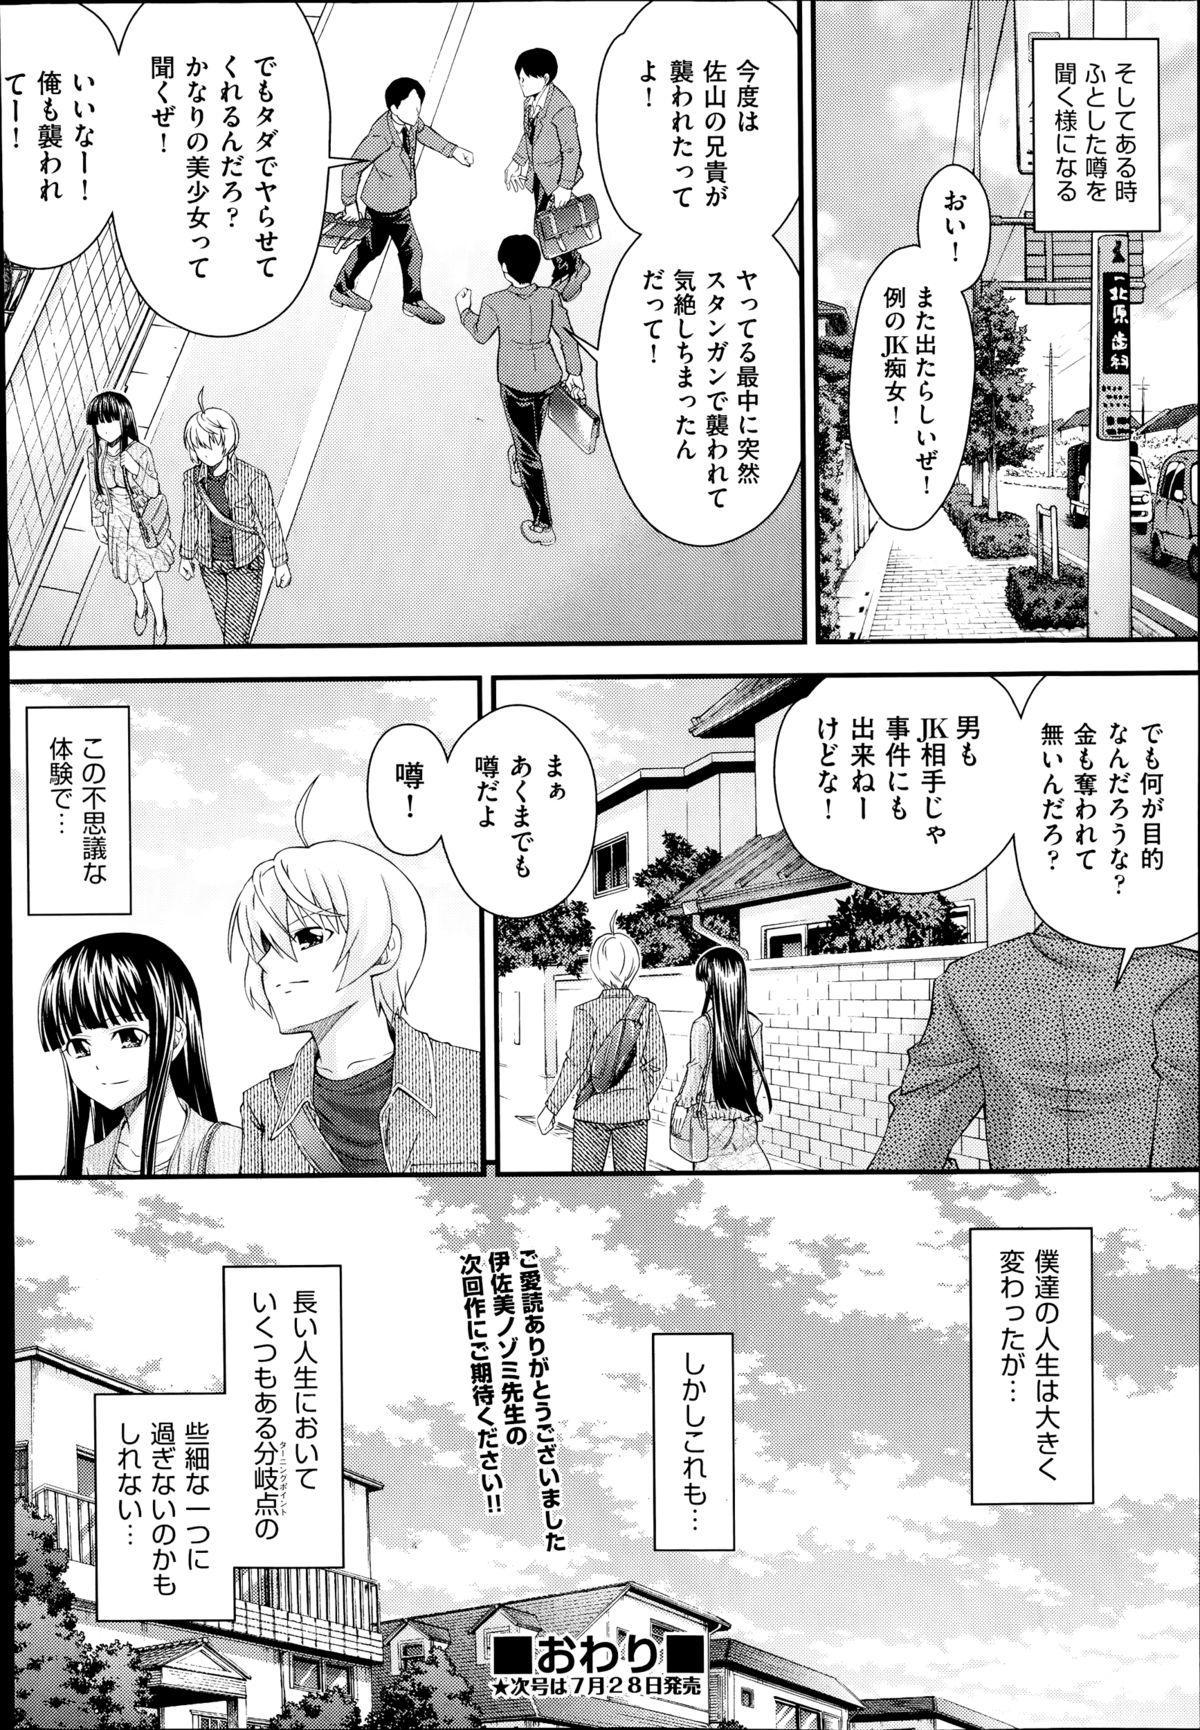 Kyoudai Replace 145